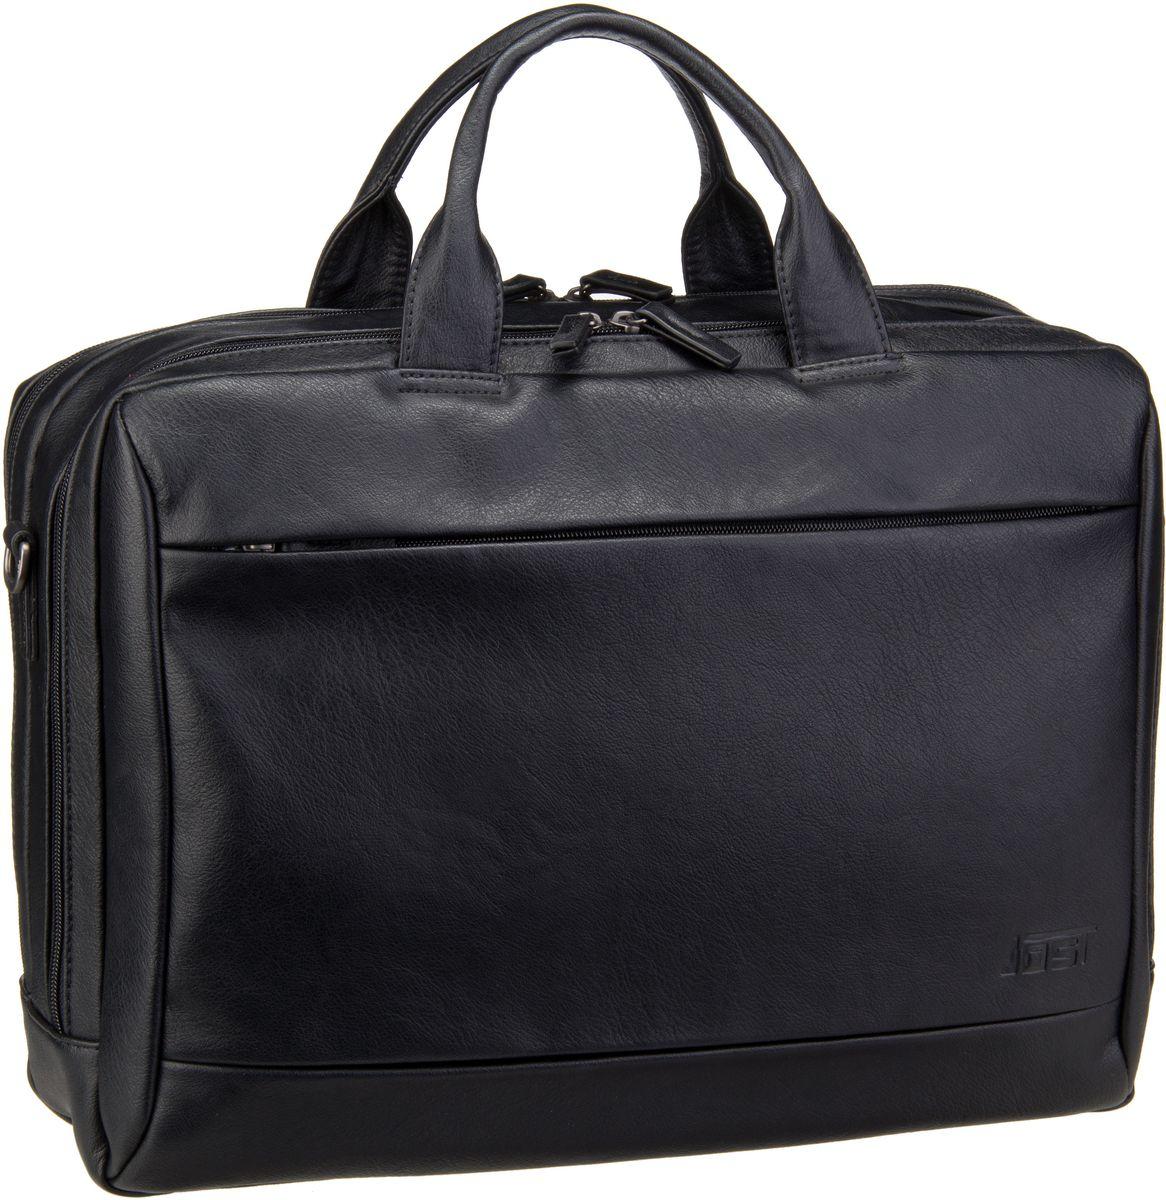 Jost Notebooktasche / Tablet Bodo 4826 Businesstasche Schwarz